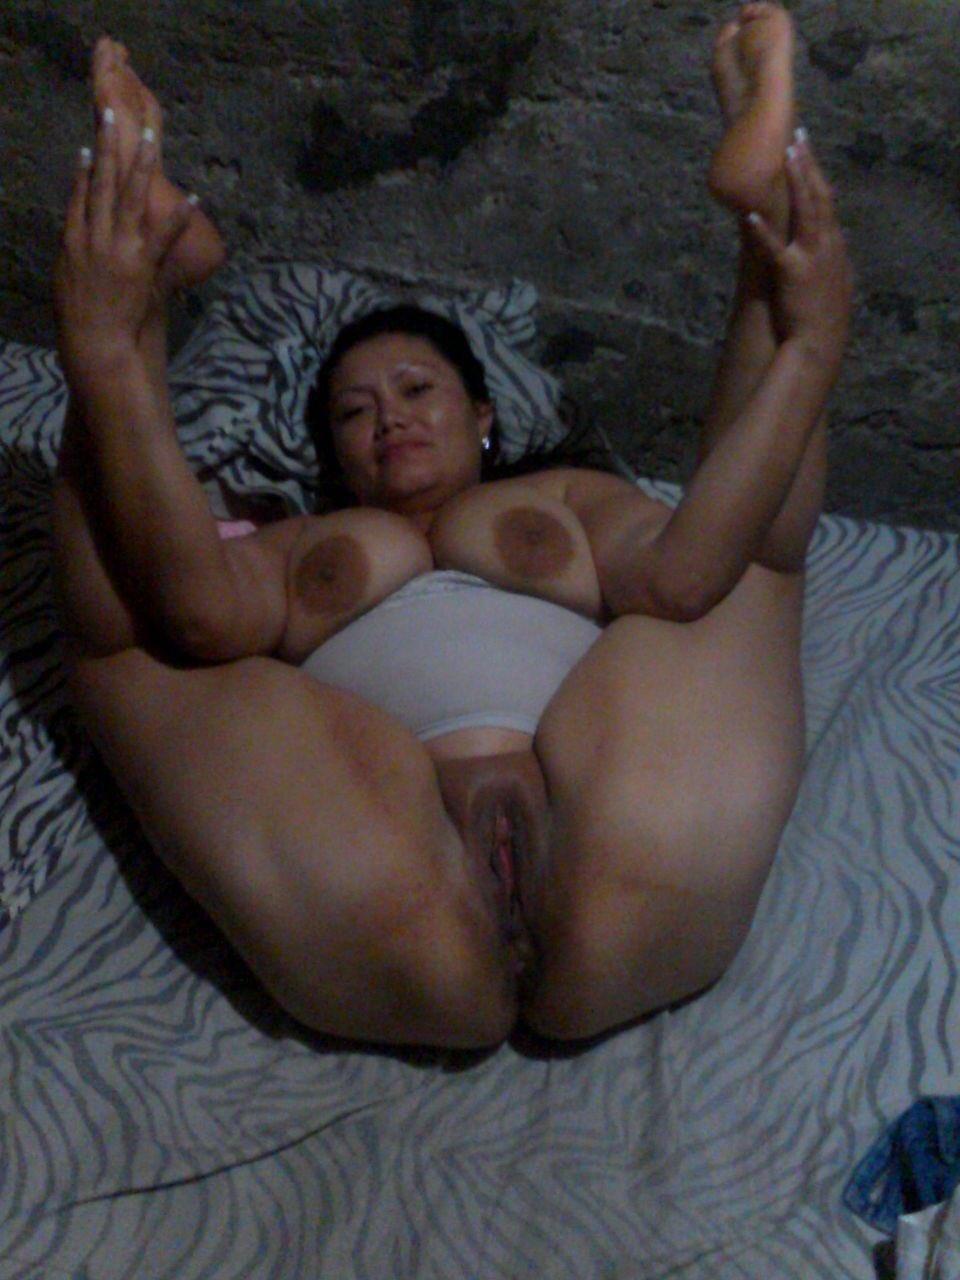 esposas vergas fotos porno para coger